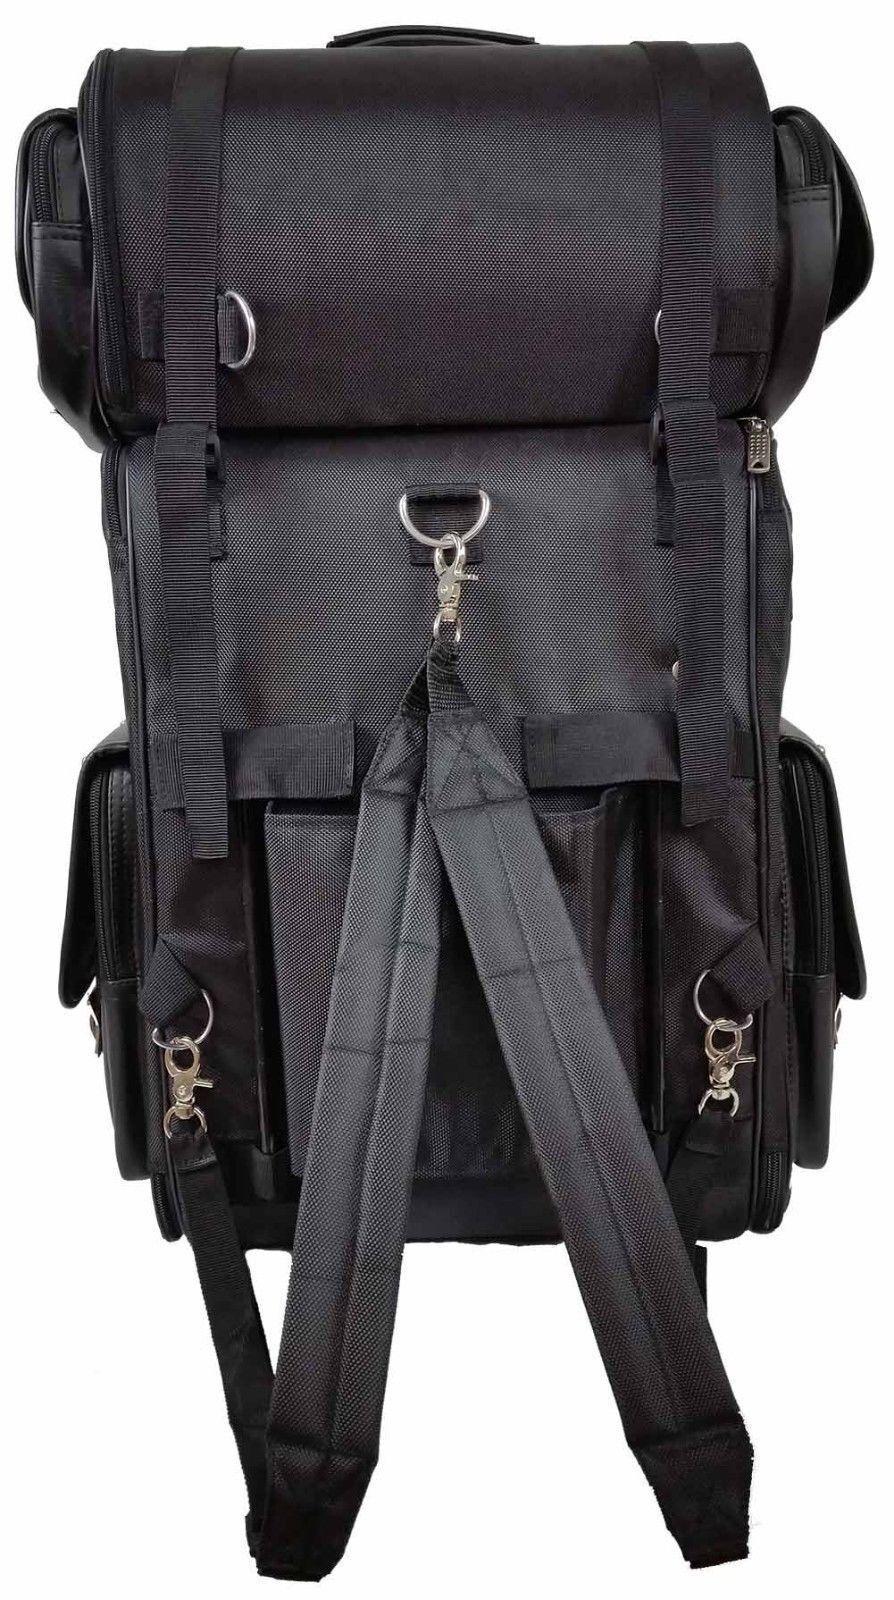 motorcycle large studded sissy bar travel bar bag back pack travel